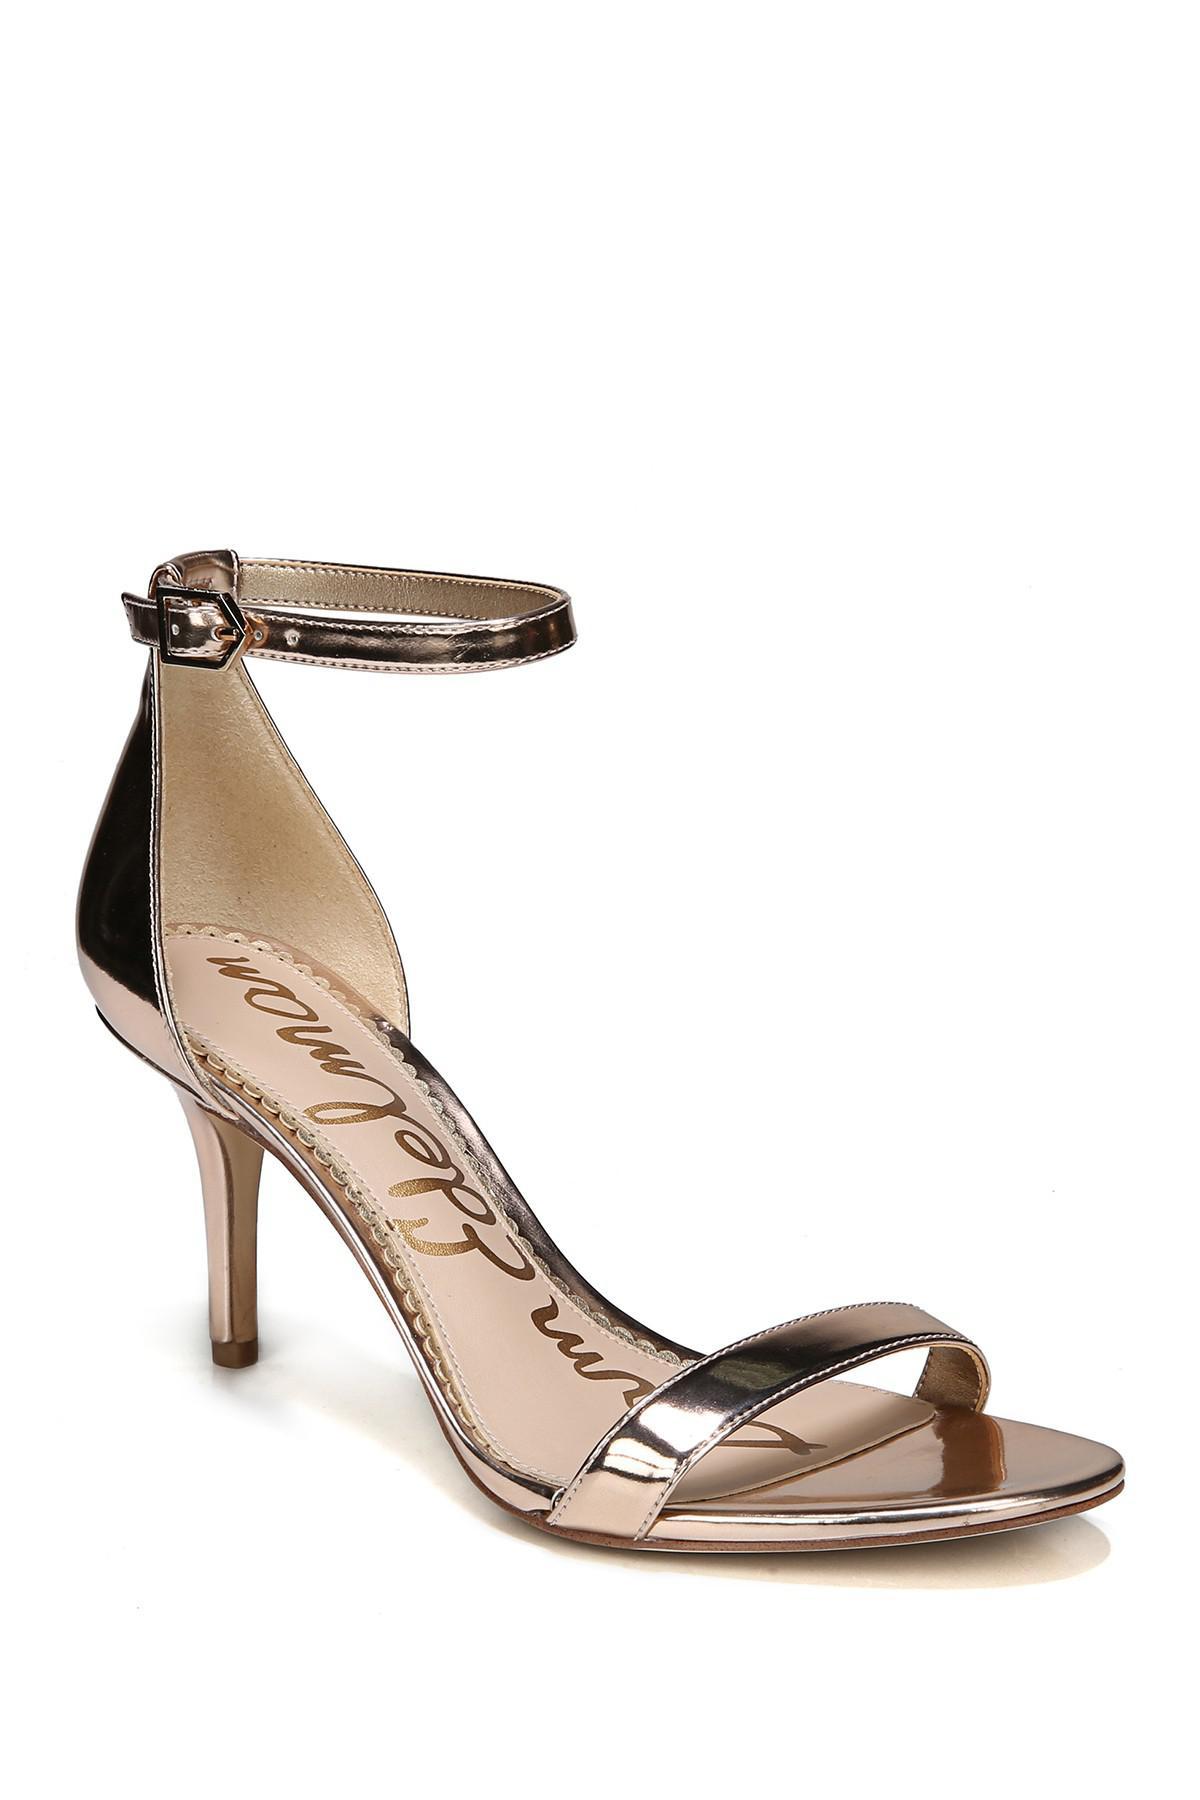 2da7a6c8dcc Lyst - Sam Edelman Patti Ankle Strap Sandal in Metallic